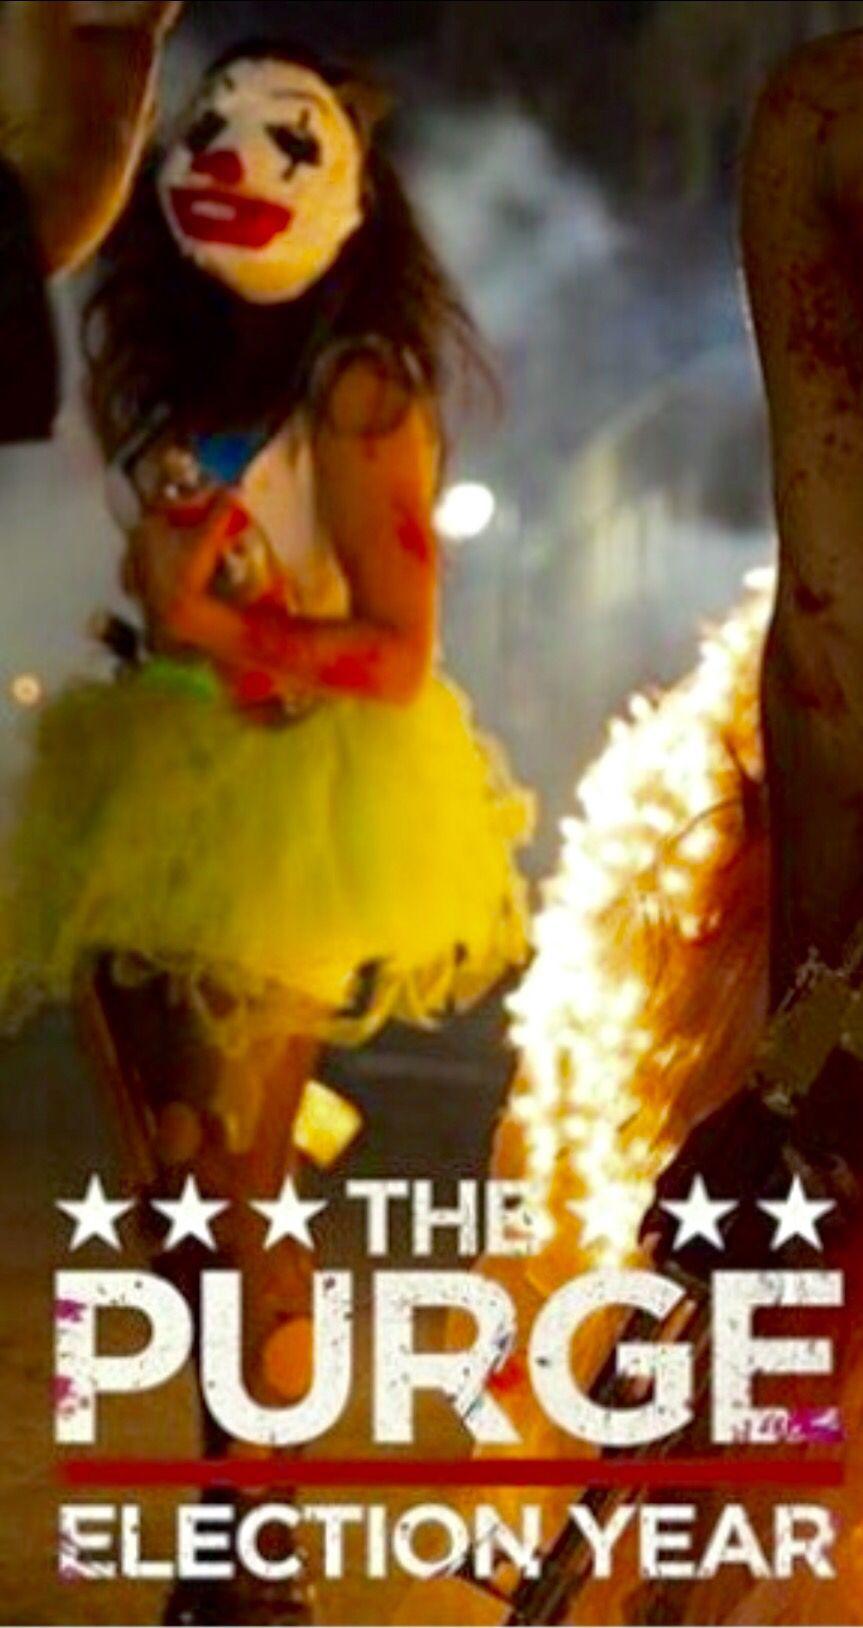 The Purge Election Year Halloween Costume